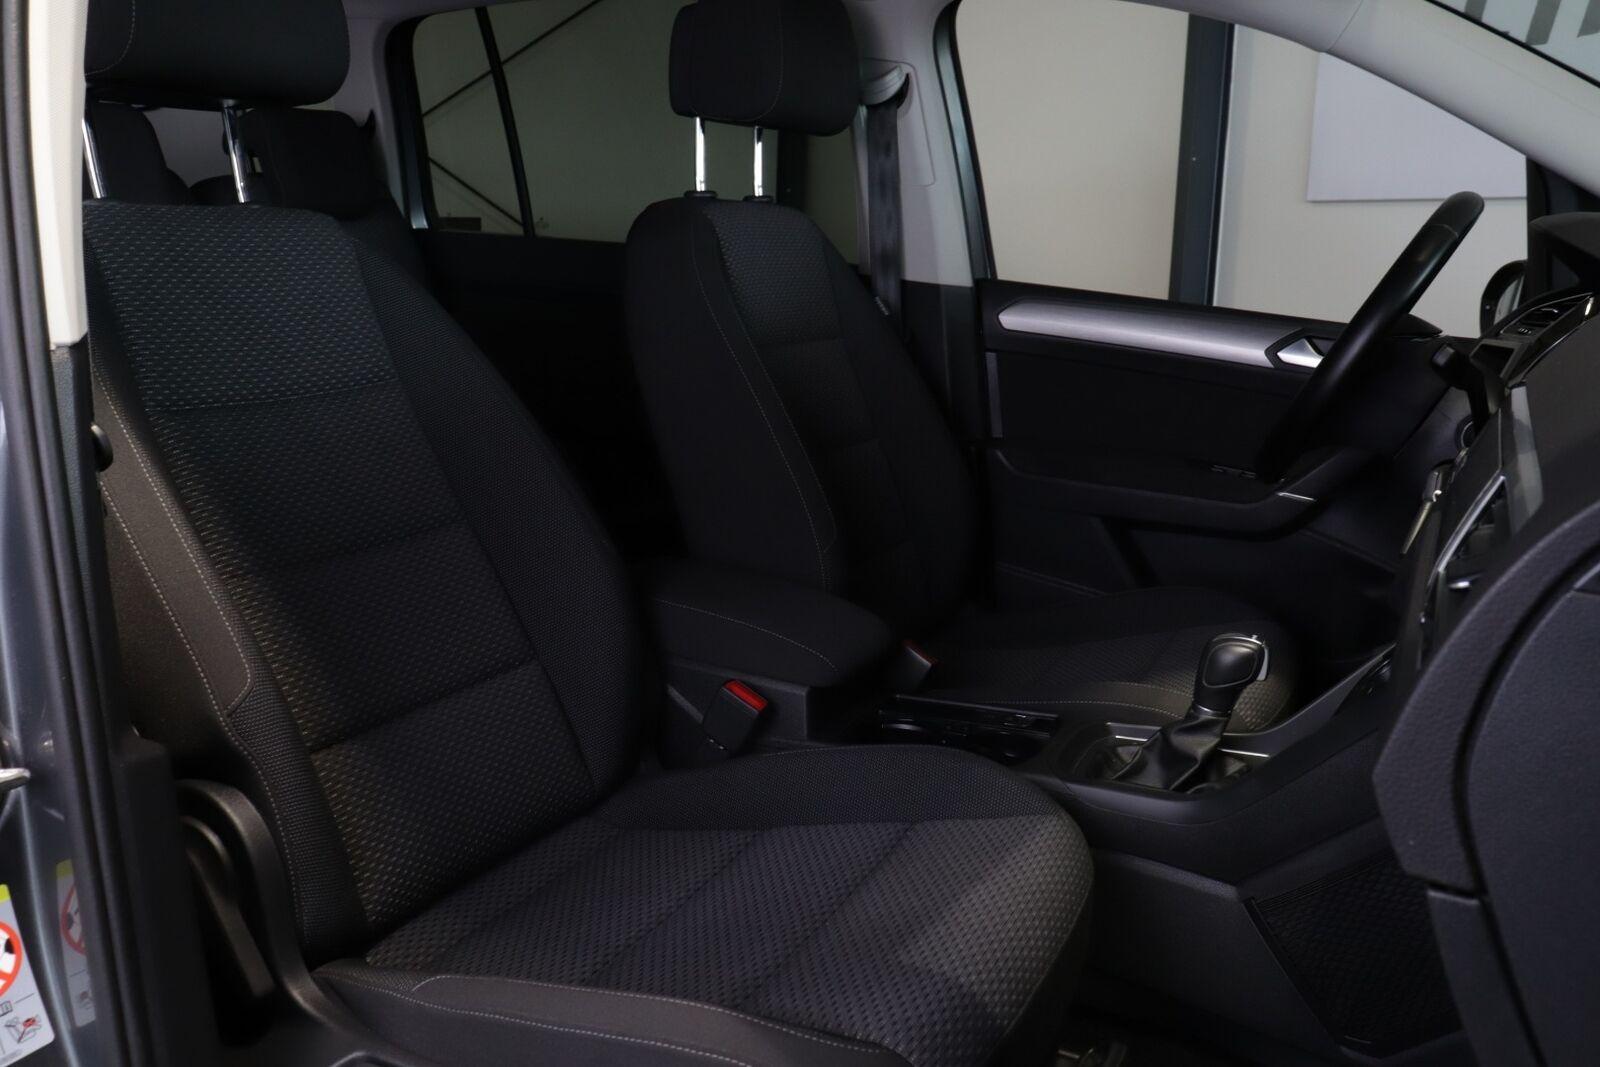 VW Touran TDi 115 Comfortline DSG 7prs